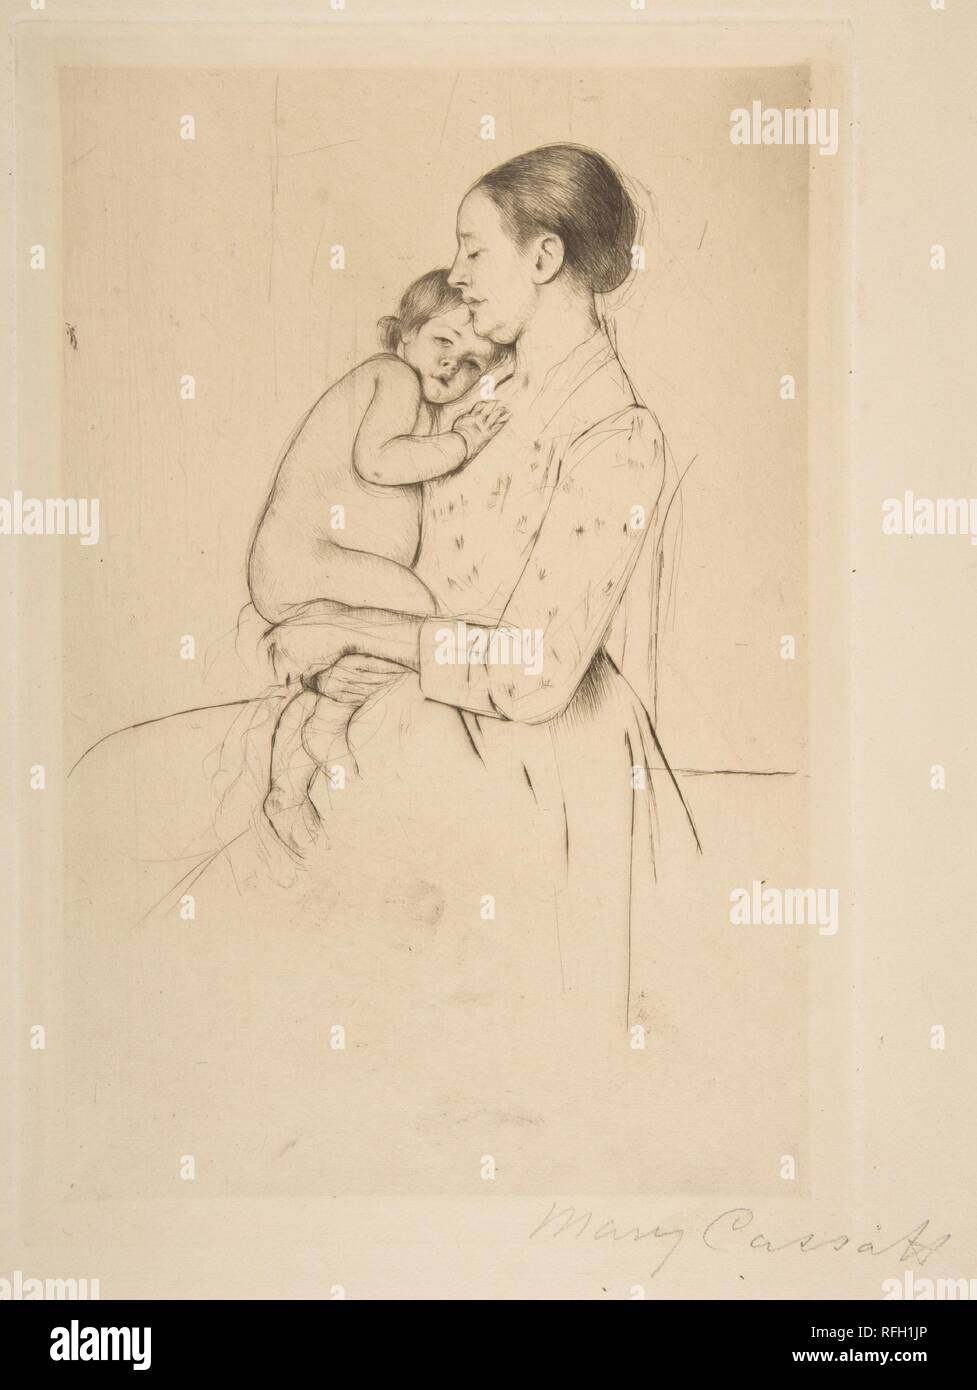 Quietude. Artist: Mary Cassatt (American, Pittsburgh, Pennsylvania 1844-1926 Le Mesnil-Théribus, Oise). Dimensions: plate: 10 3/16 x 7 in. (25.9 x 17.8 cm)  sheet: 15 1/16 x 11 in. (38.3 x 27.9 cm). Date: ca. 1891. Museum: Metropolitan Museum of Art, New York, USA. Stock Photo